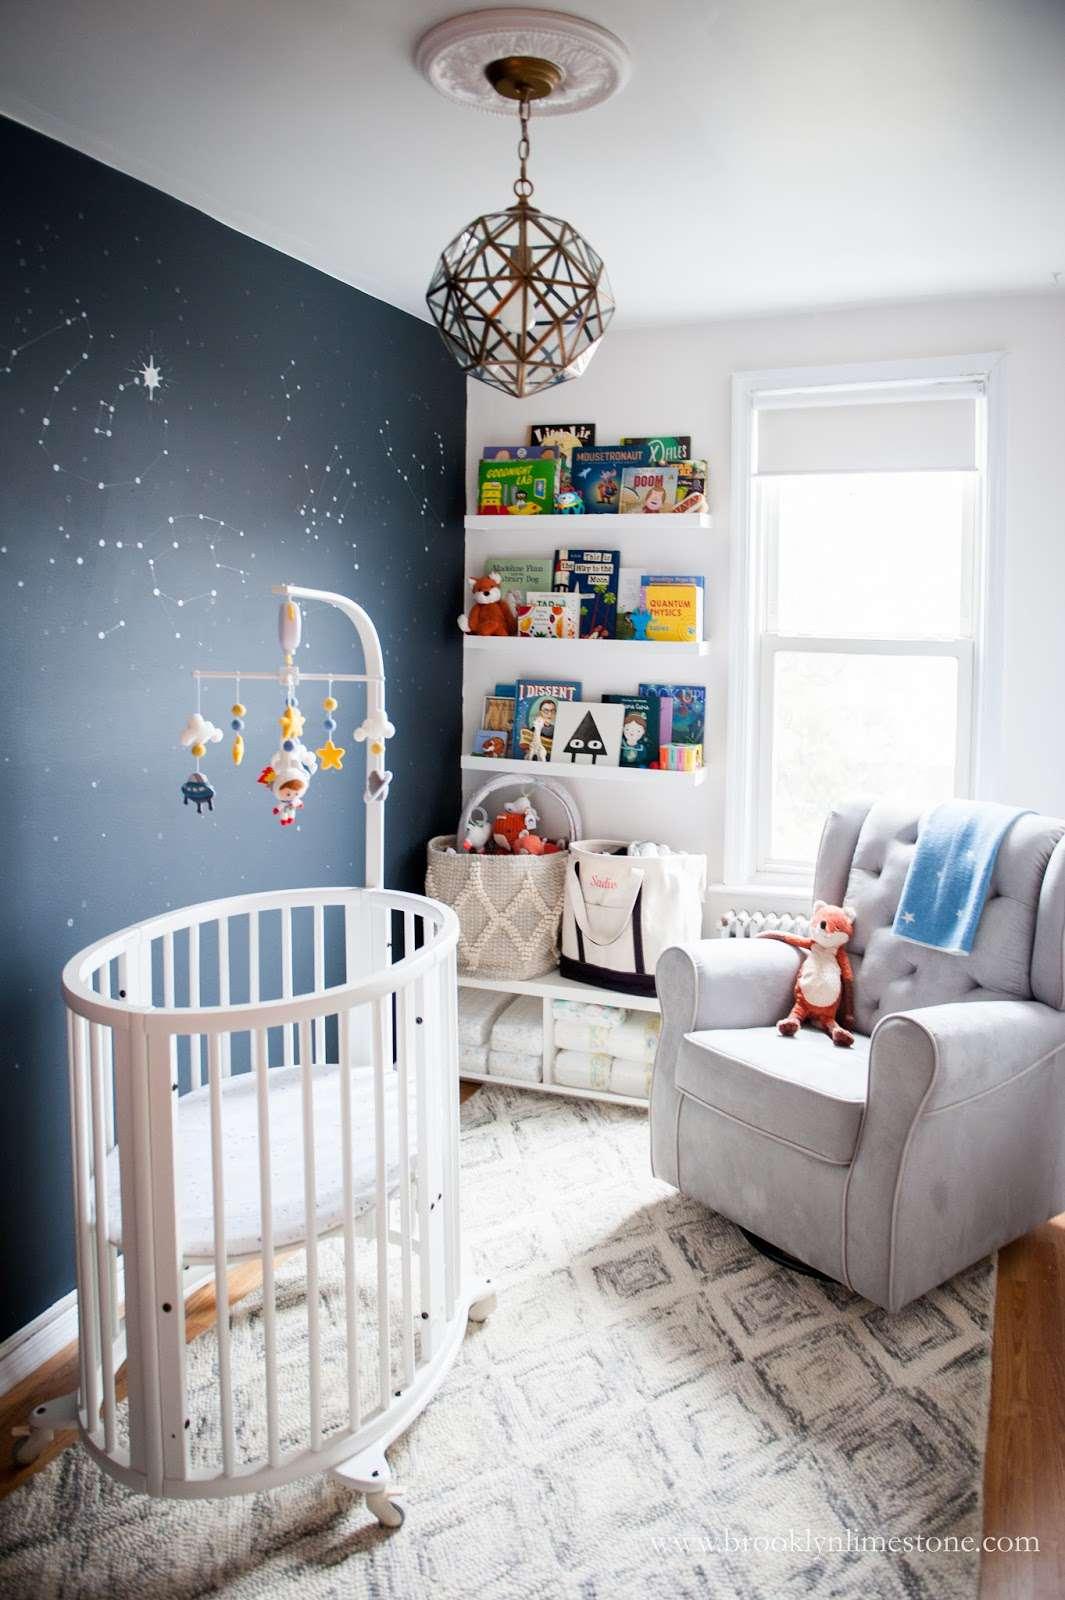 Small urban nursery with space-theme